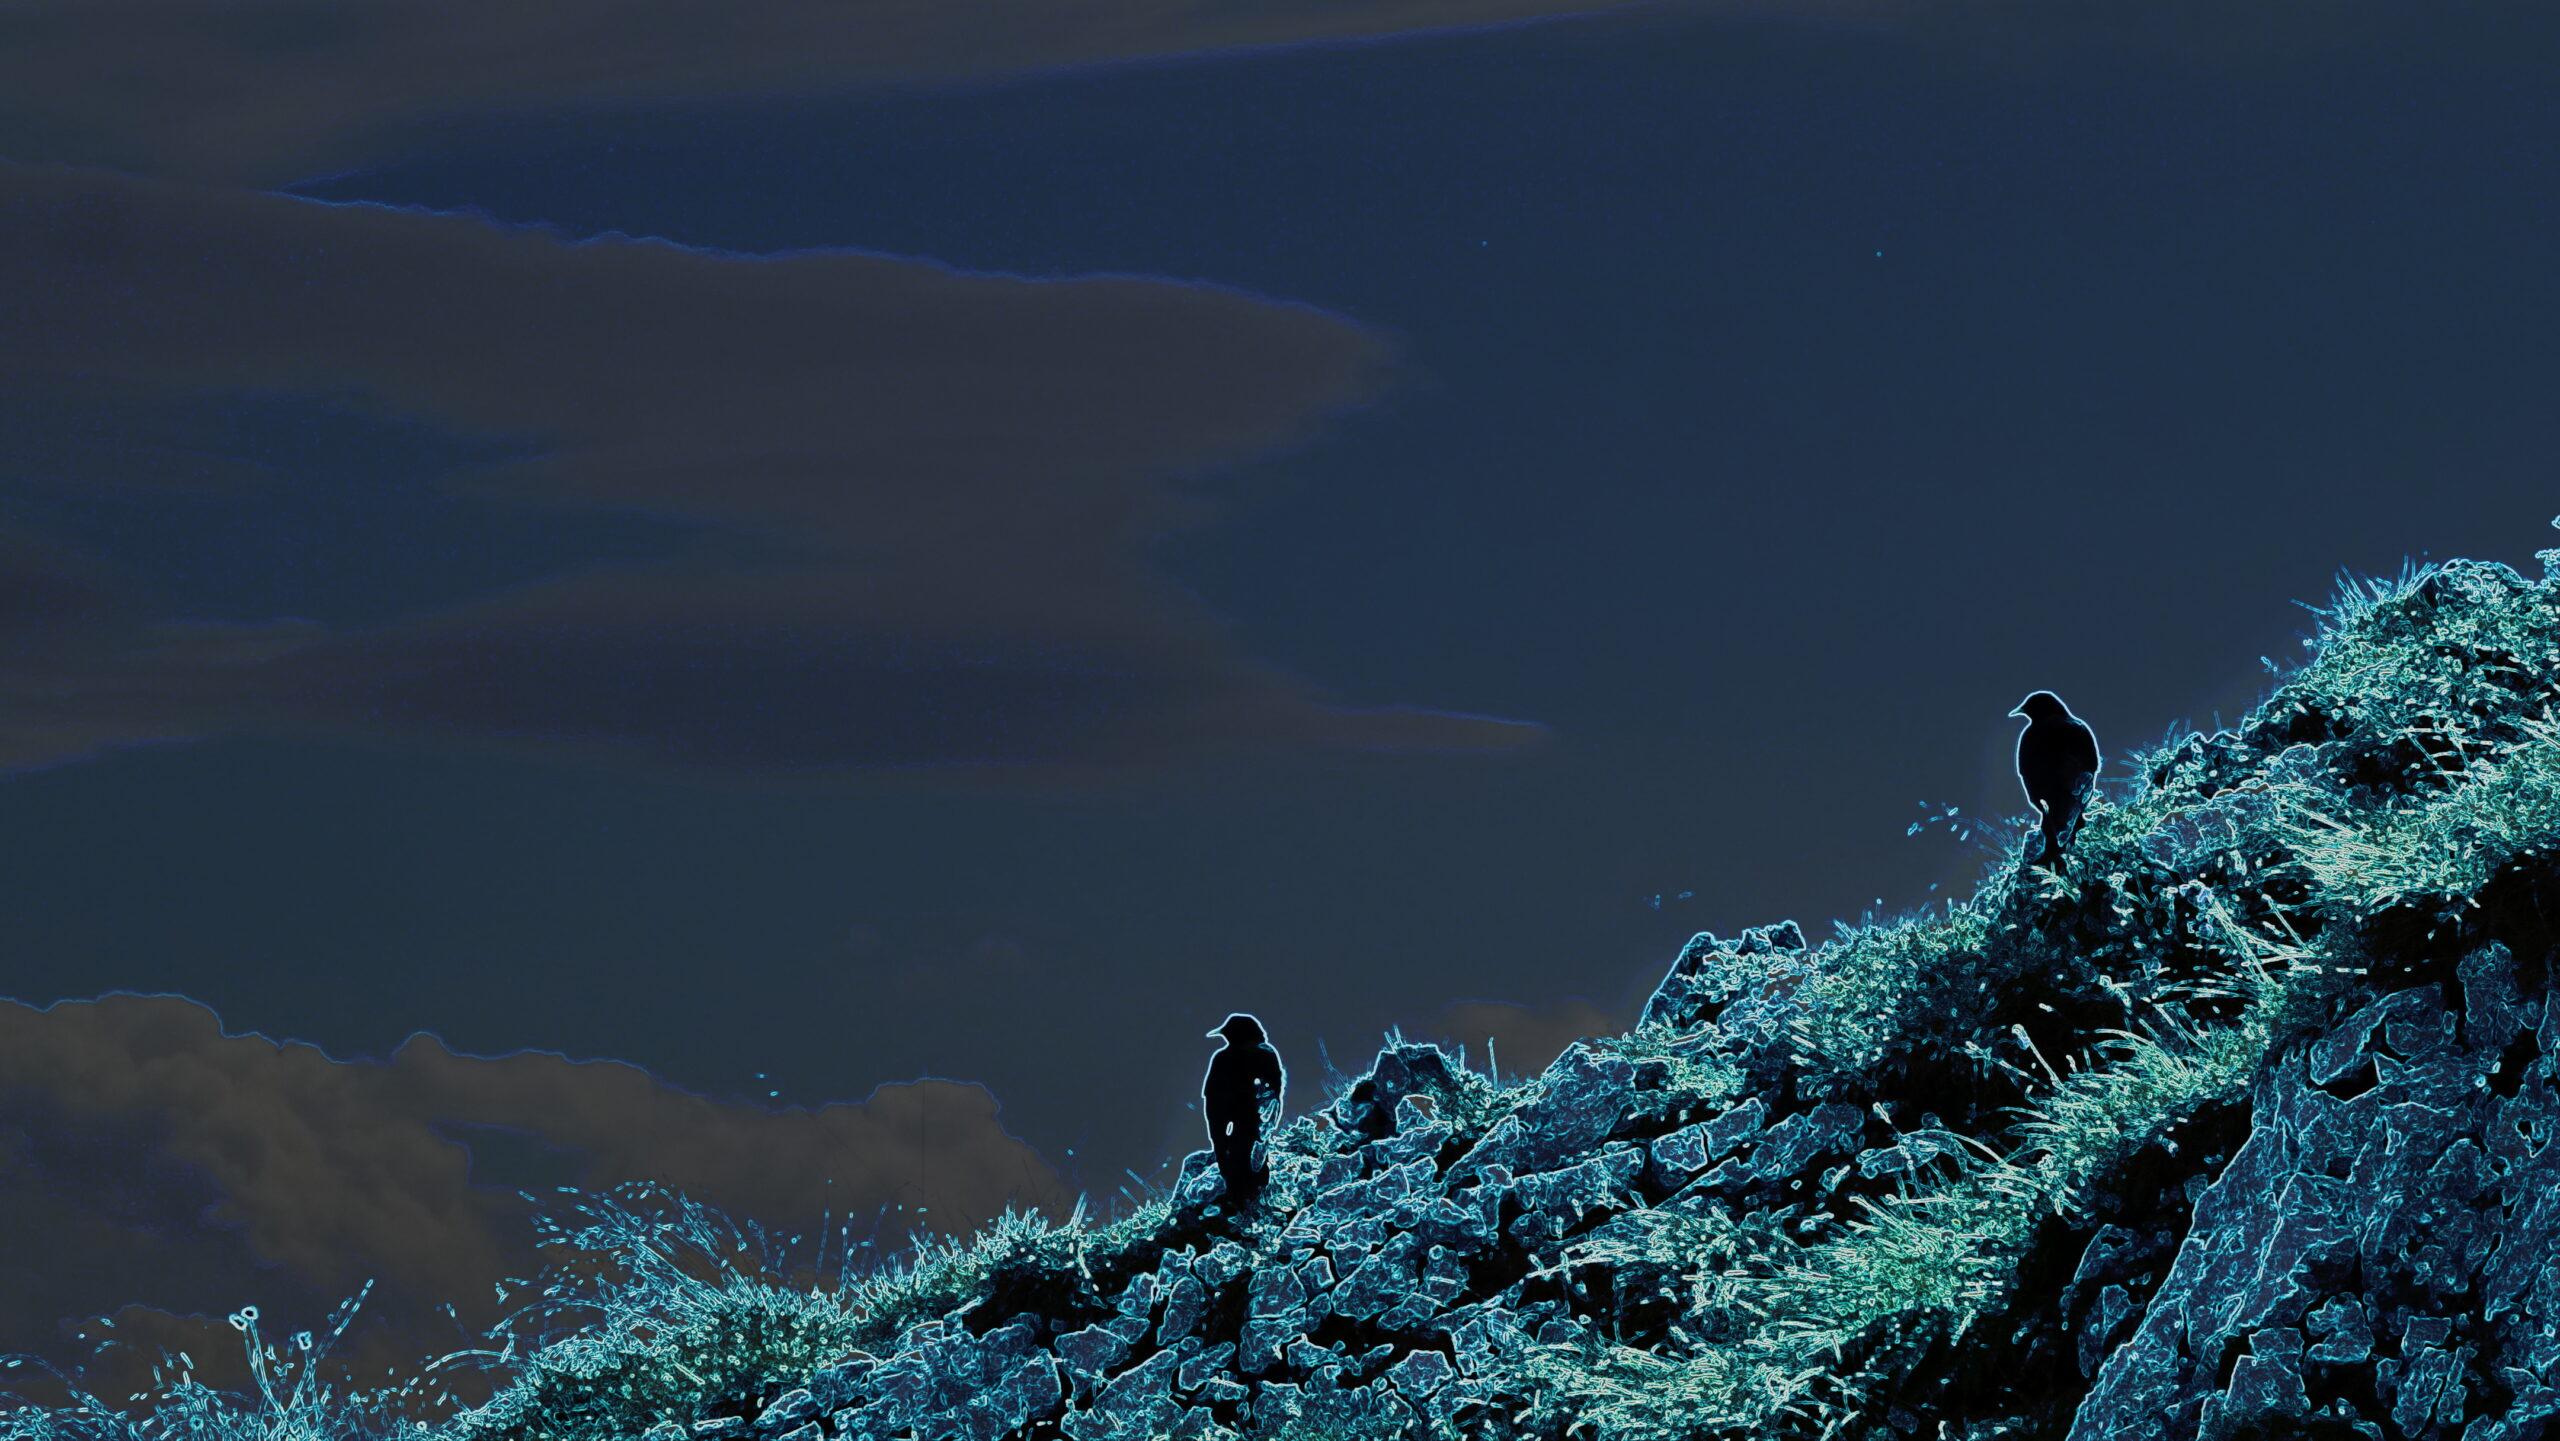 Mystische-Untersbergdohlen-in-Neonblue-by-Emo-Blue-EmanuelOne